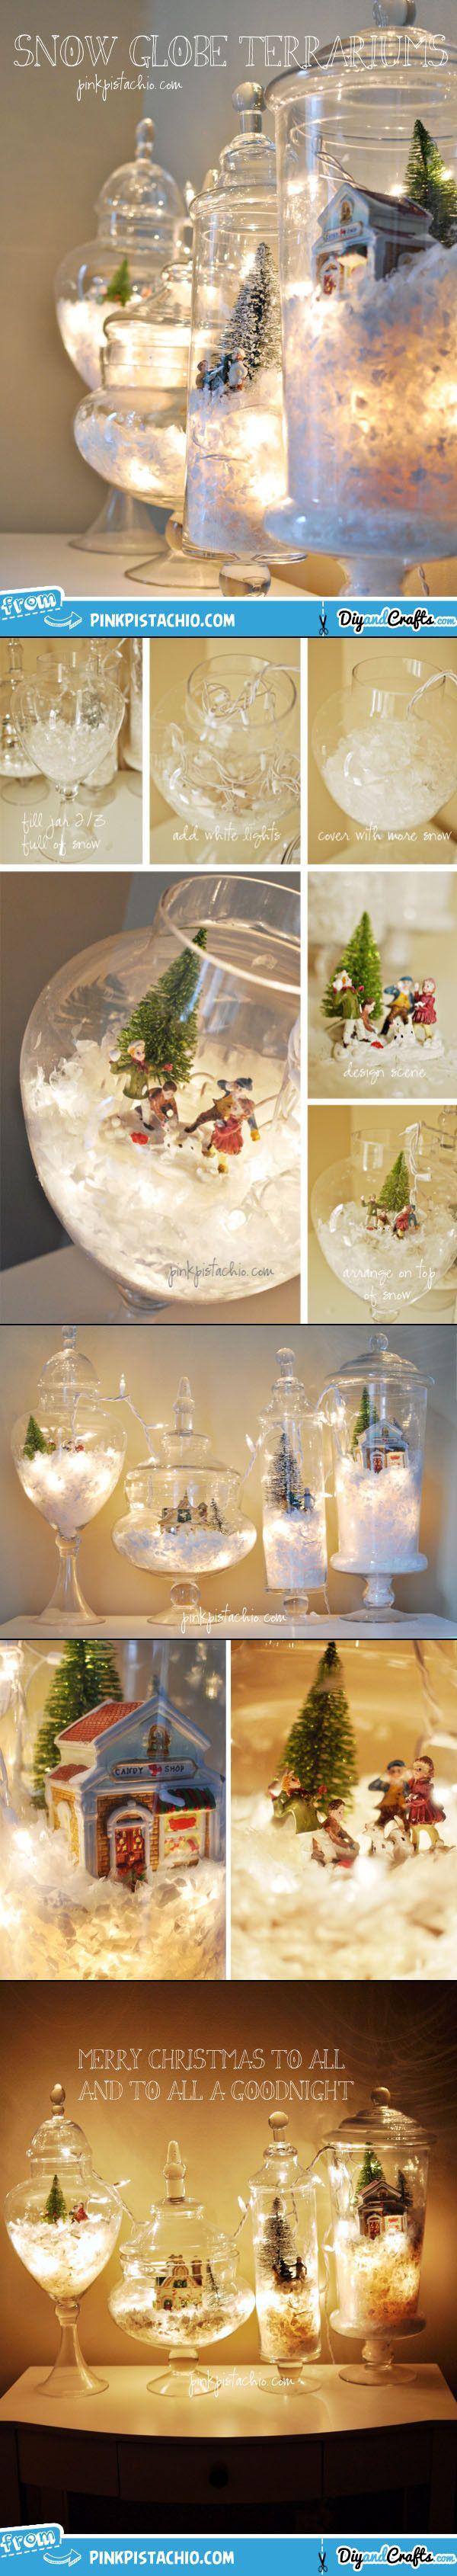 DIY Snow Globe Terrariums                                                                                                                                                                                 More